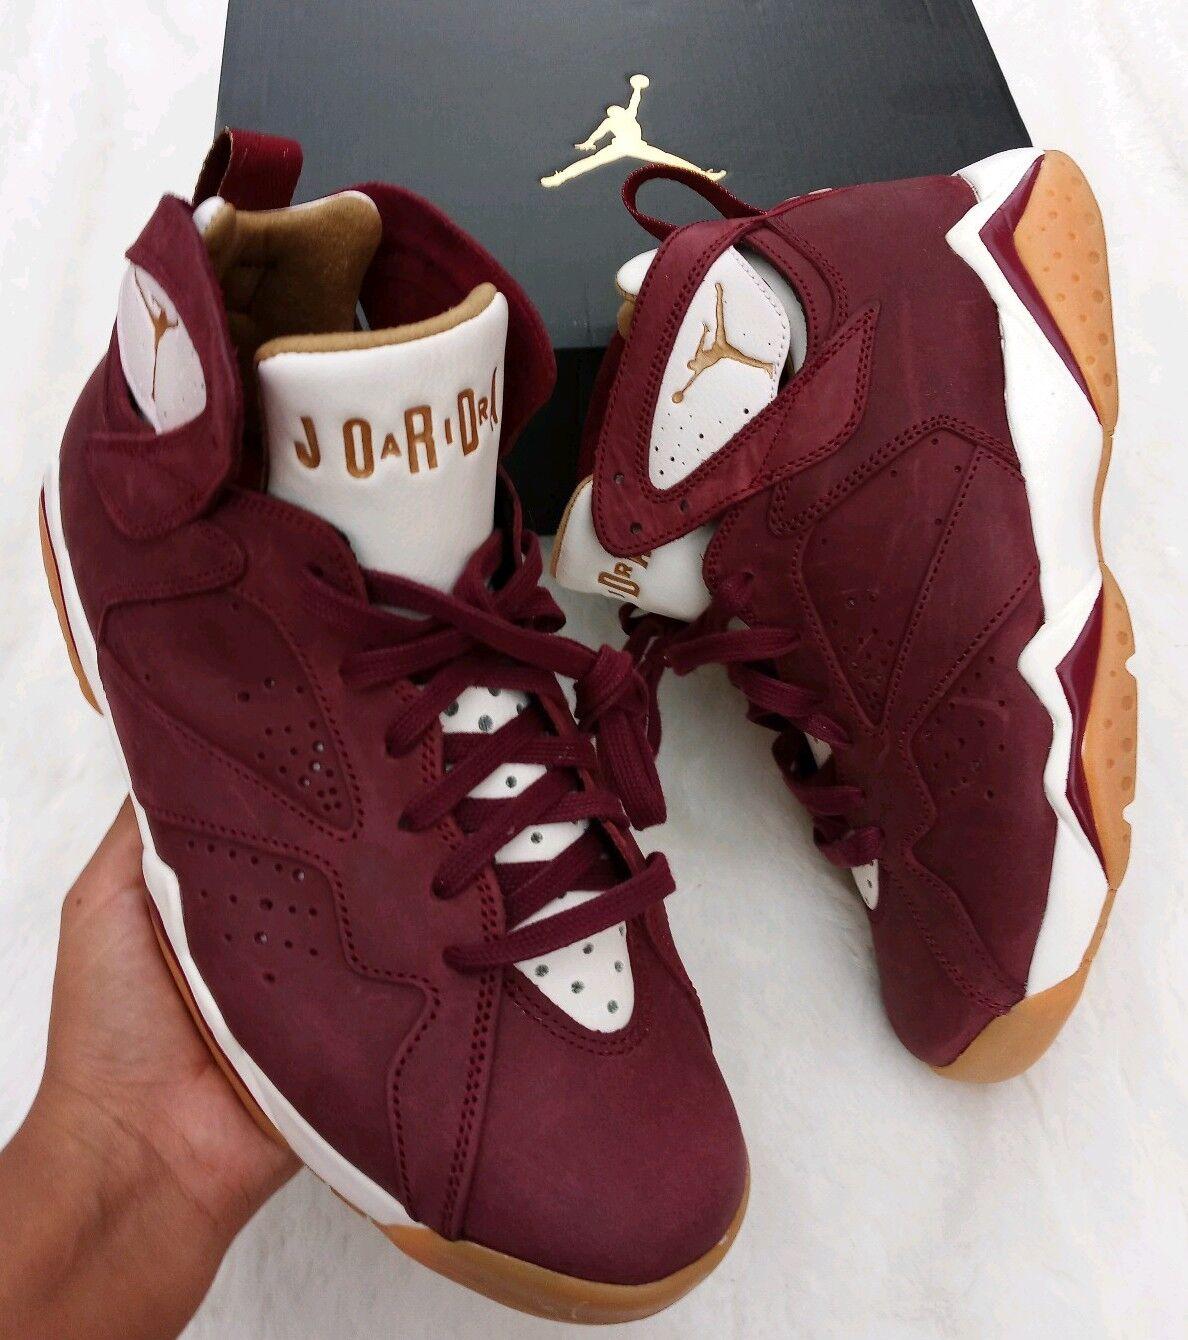 C Team Nike Hombre Jordan Goma amp;c Cigar Para Retro Vii Rojo Dorado 7 rdtshQCx